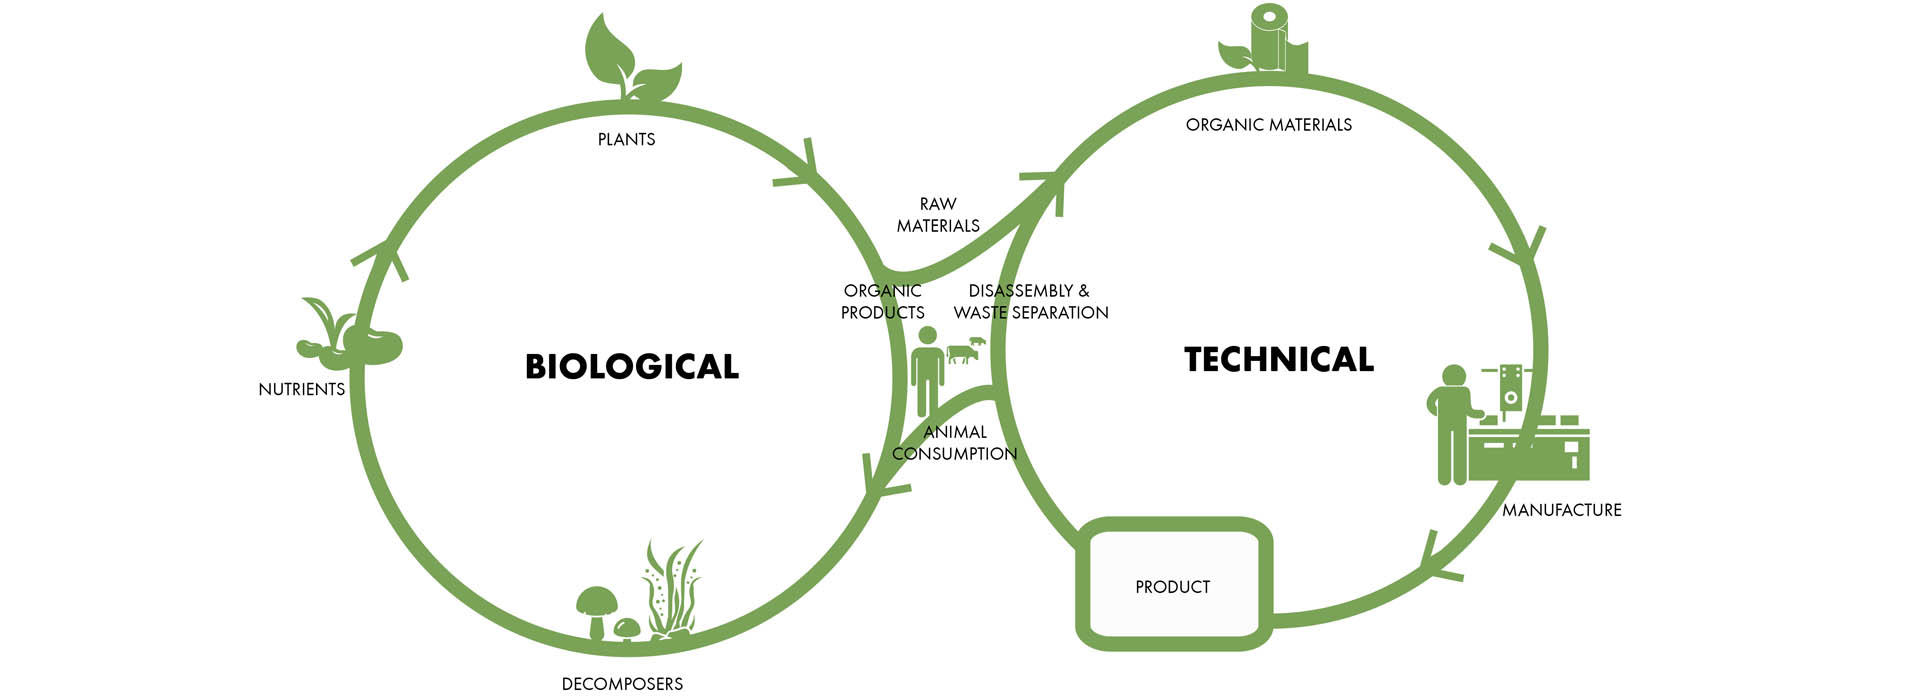 Design for Circular Economy